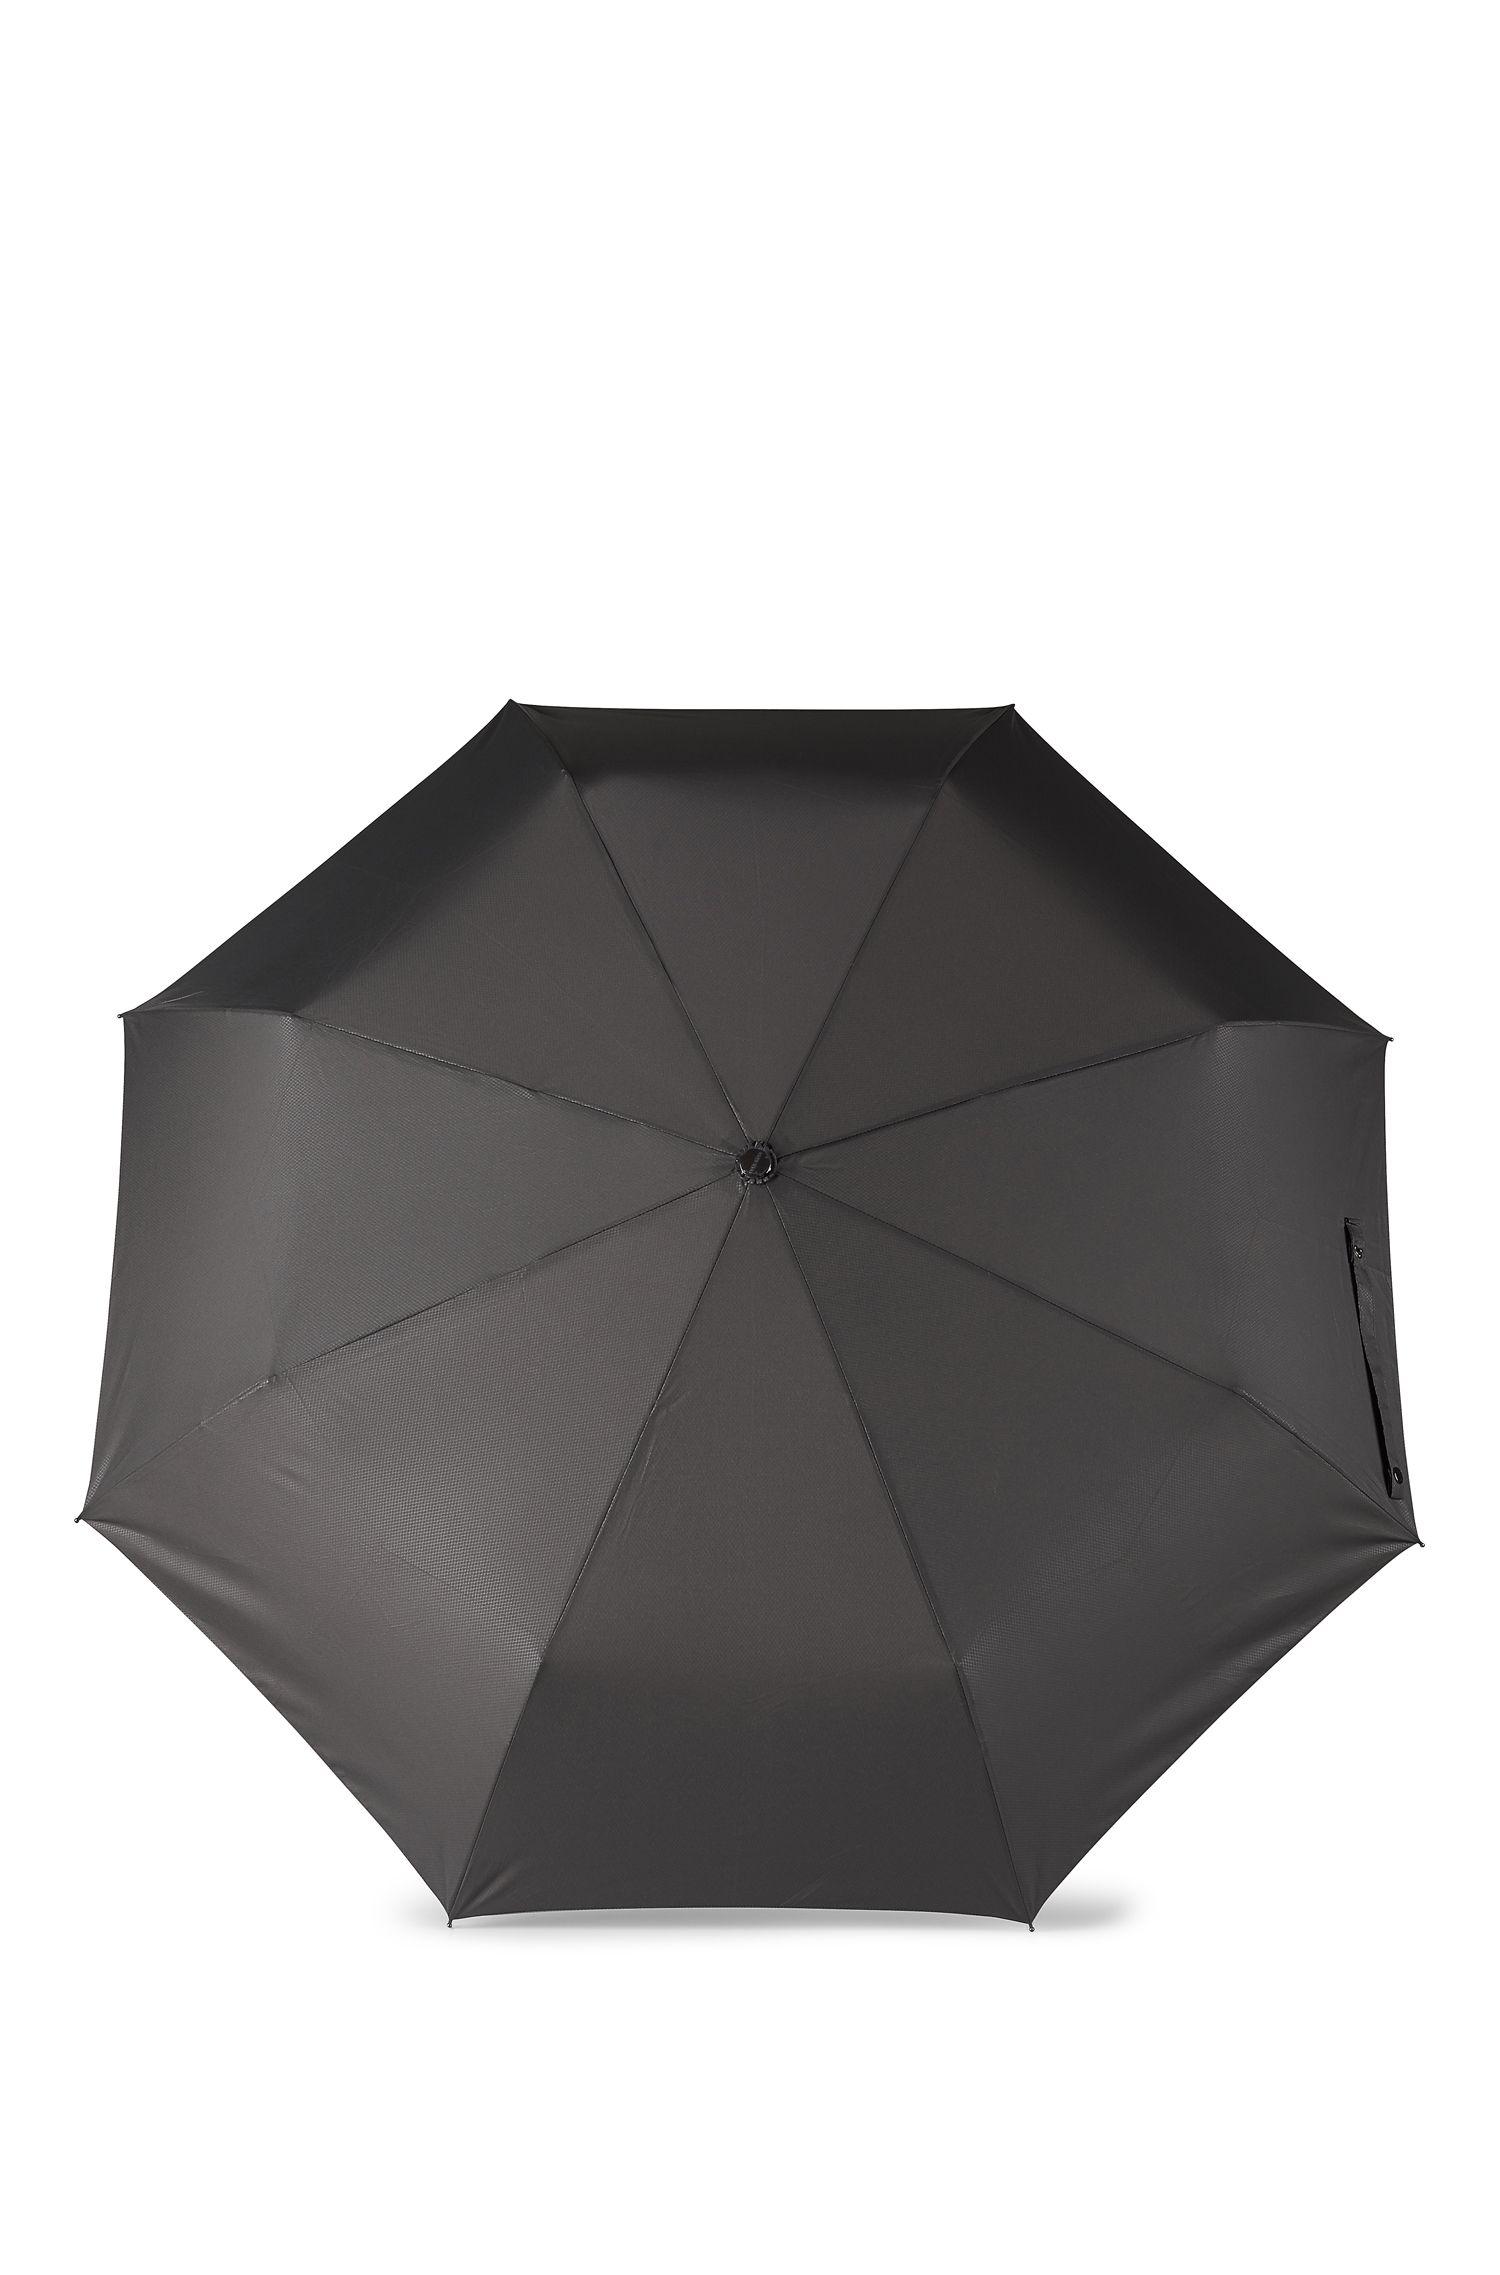 'Umbrella New Loop Dark' | Aluminum Frame Patterned Pocket Umbrella